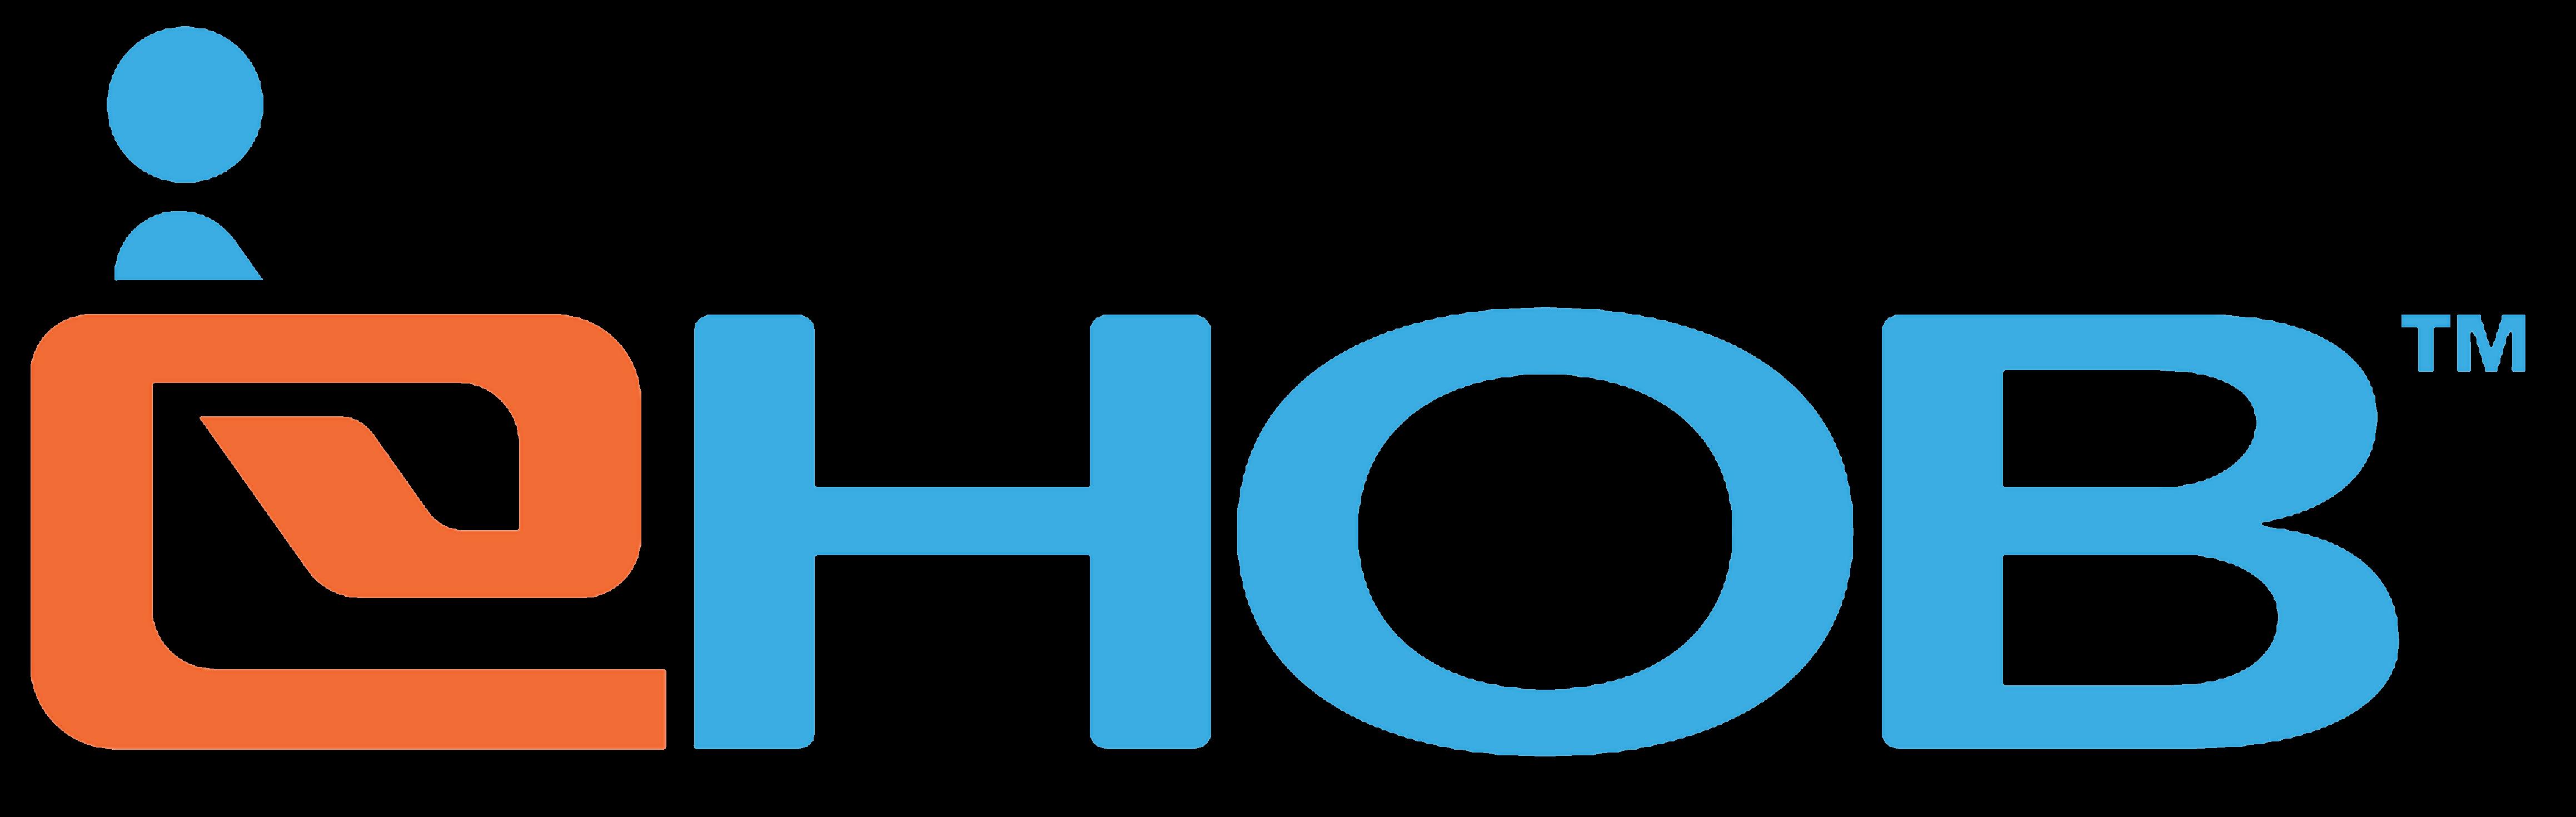 Spry - EHOB Supply